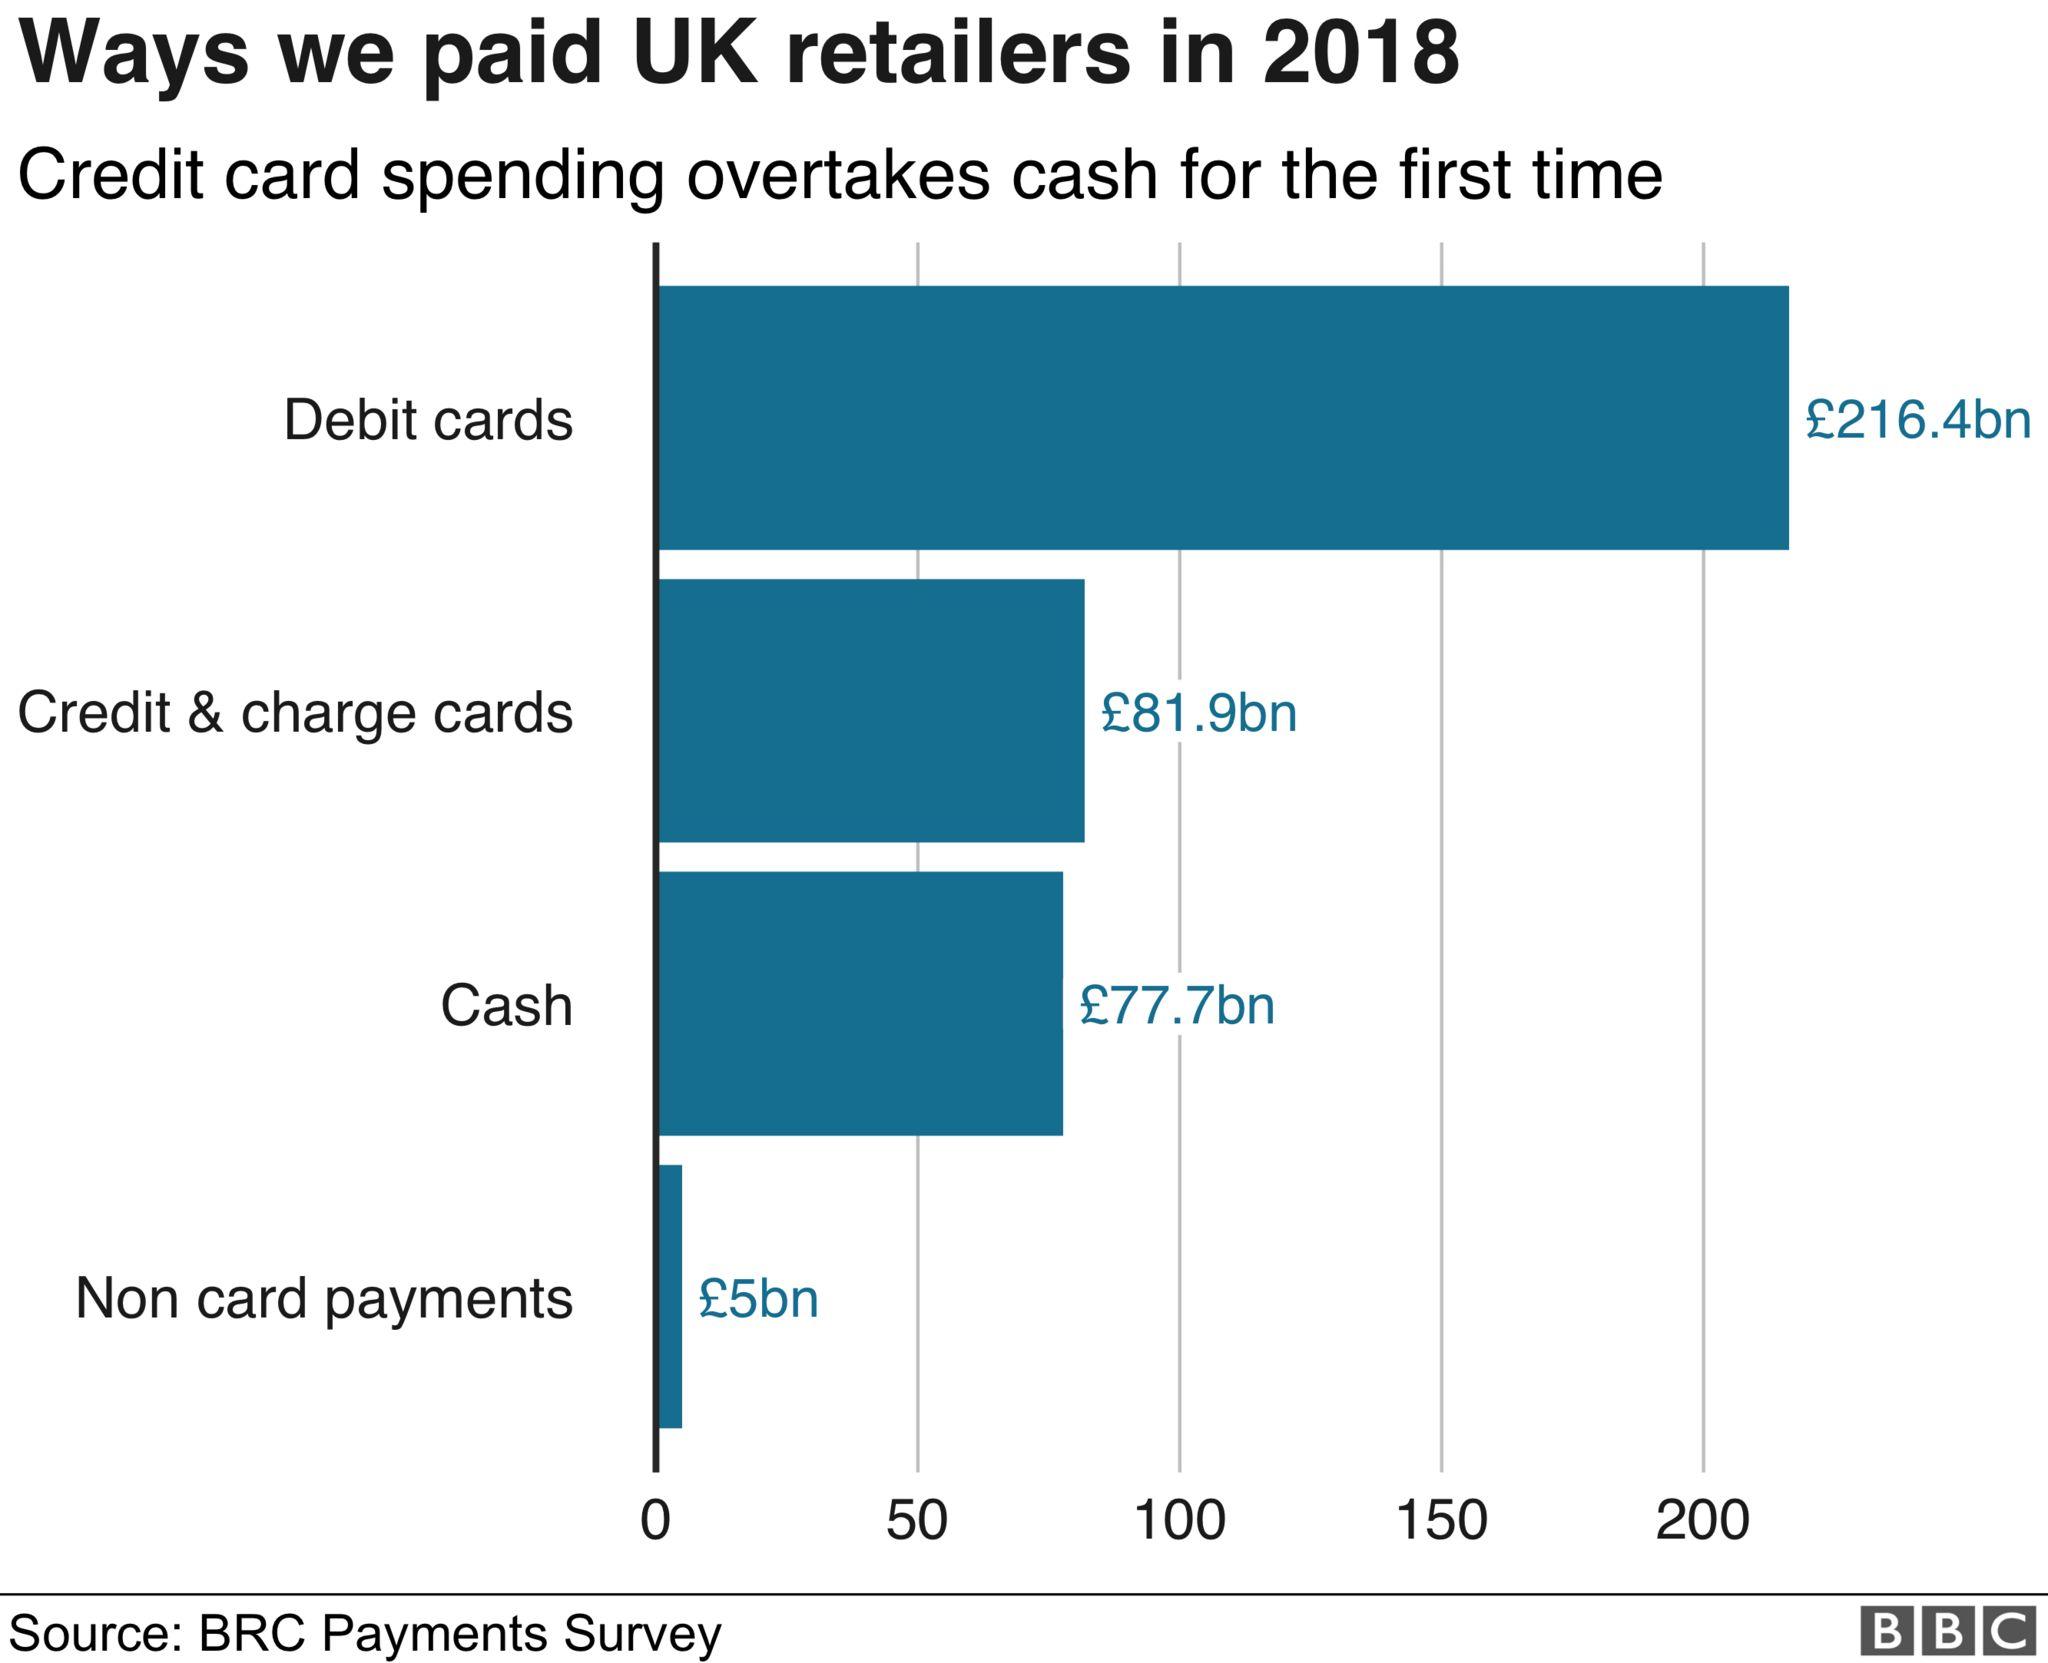 ways we paid retailers in 2018